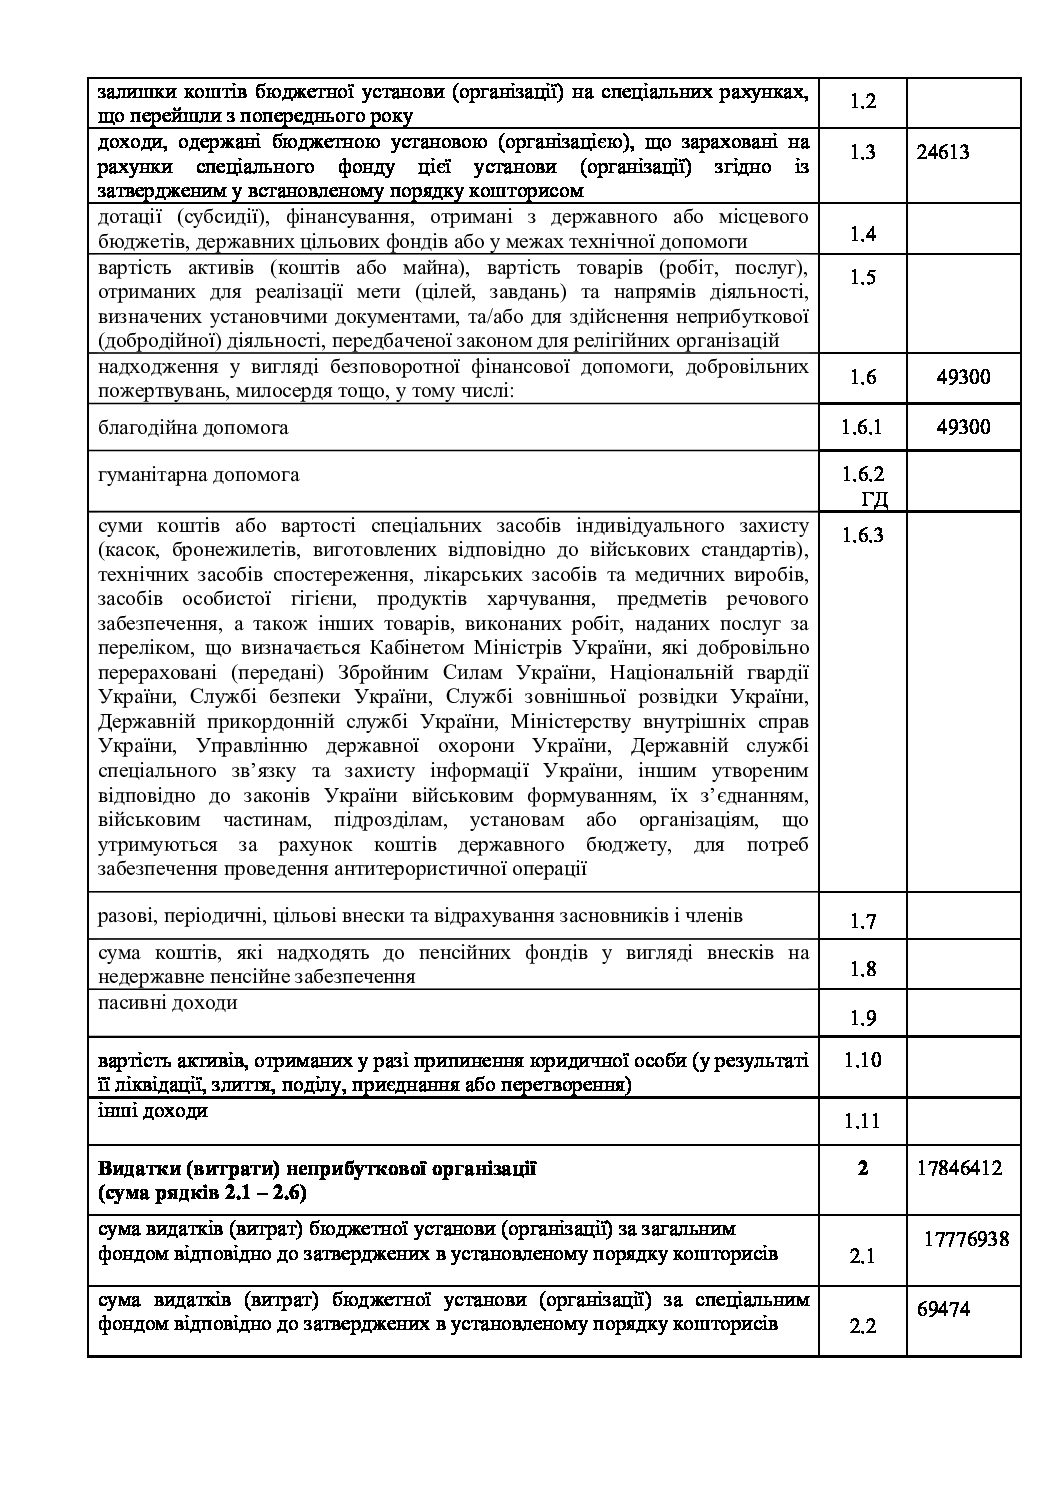 Report_2